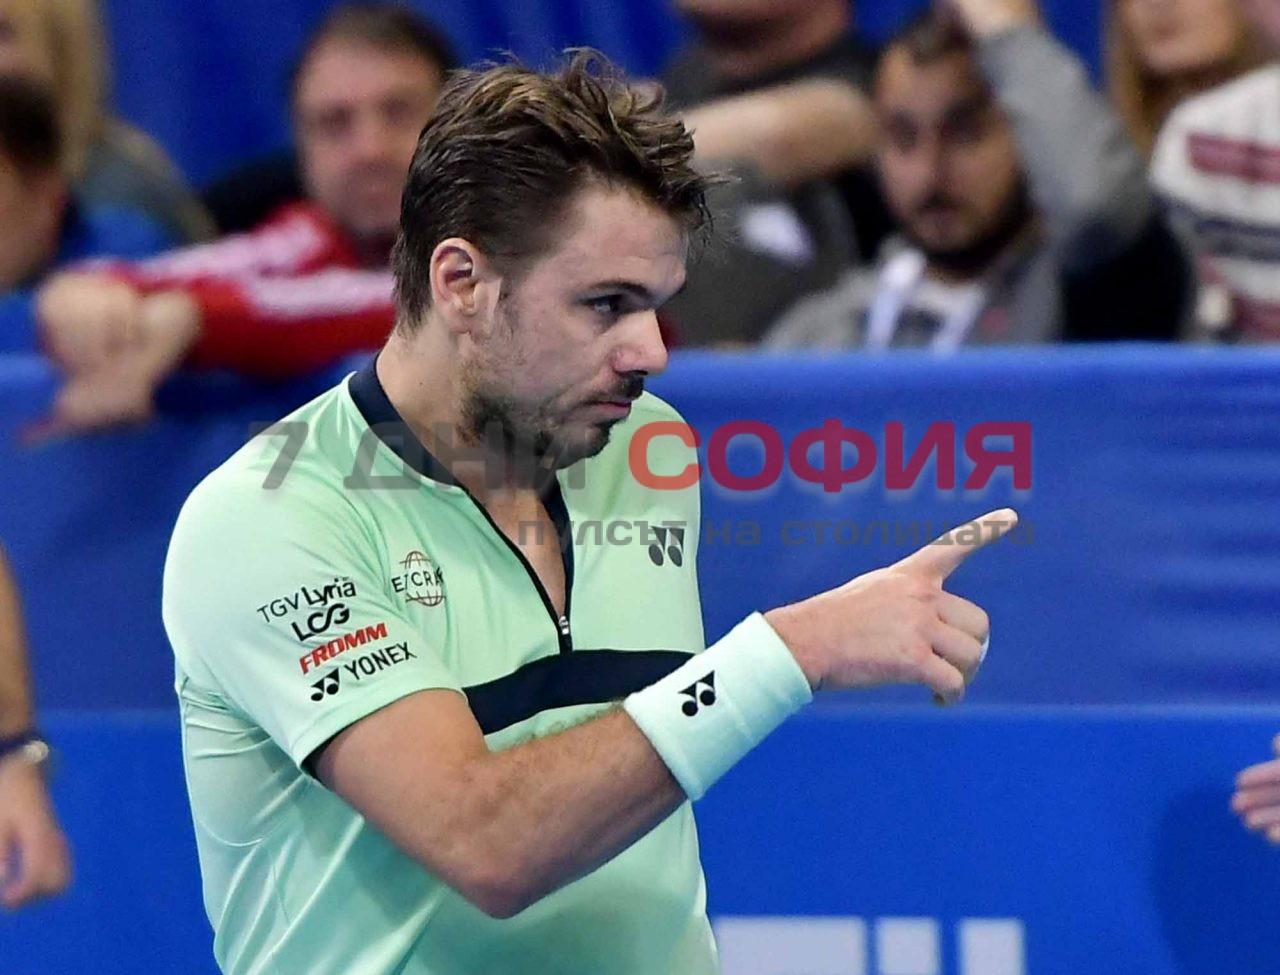 тенис Софиа Оупен 2018 (33) Вавринка